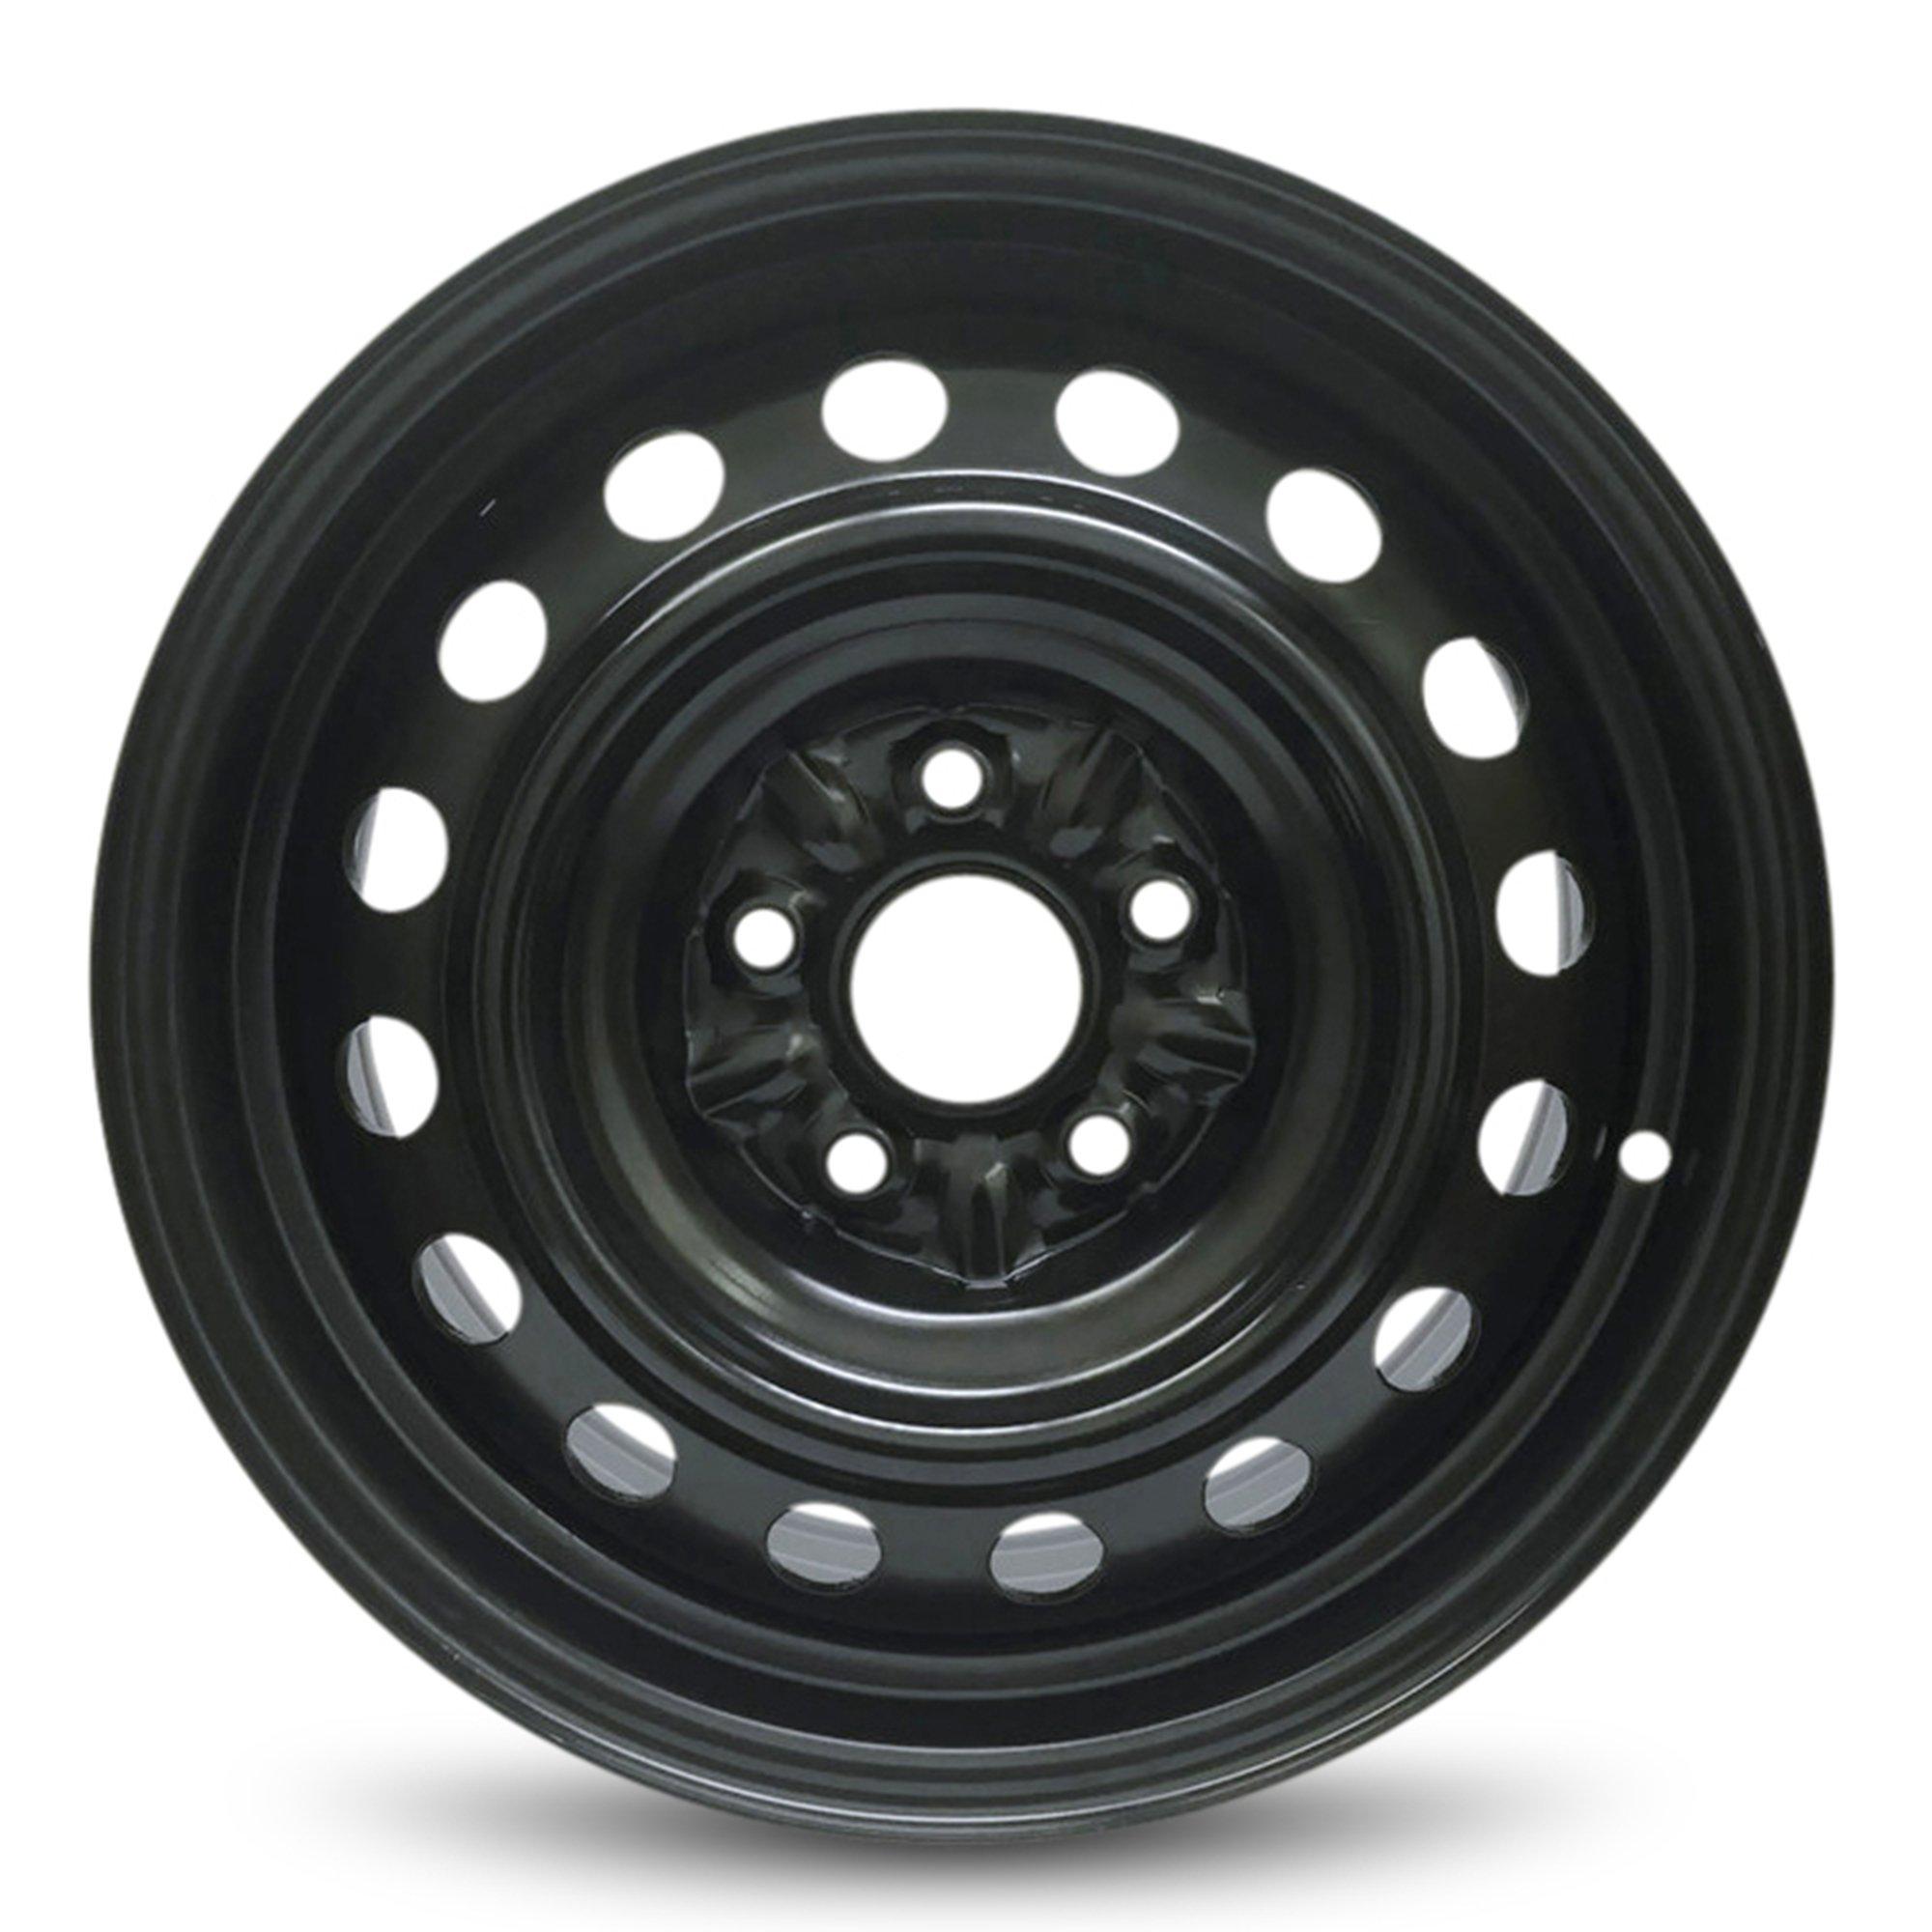 Toyota Camry 16'' 5 Lug Steel Wheel/16x6.5 Inch Steel Rim